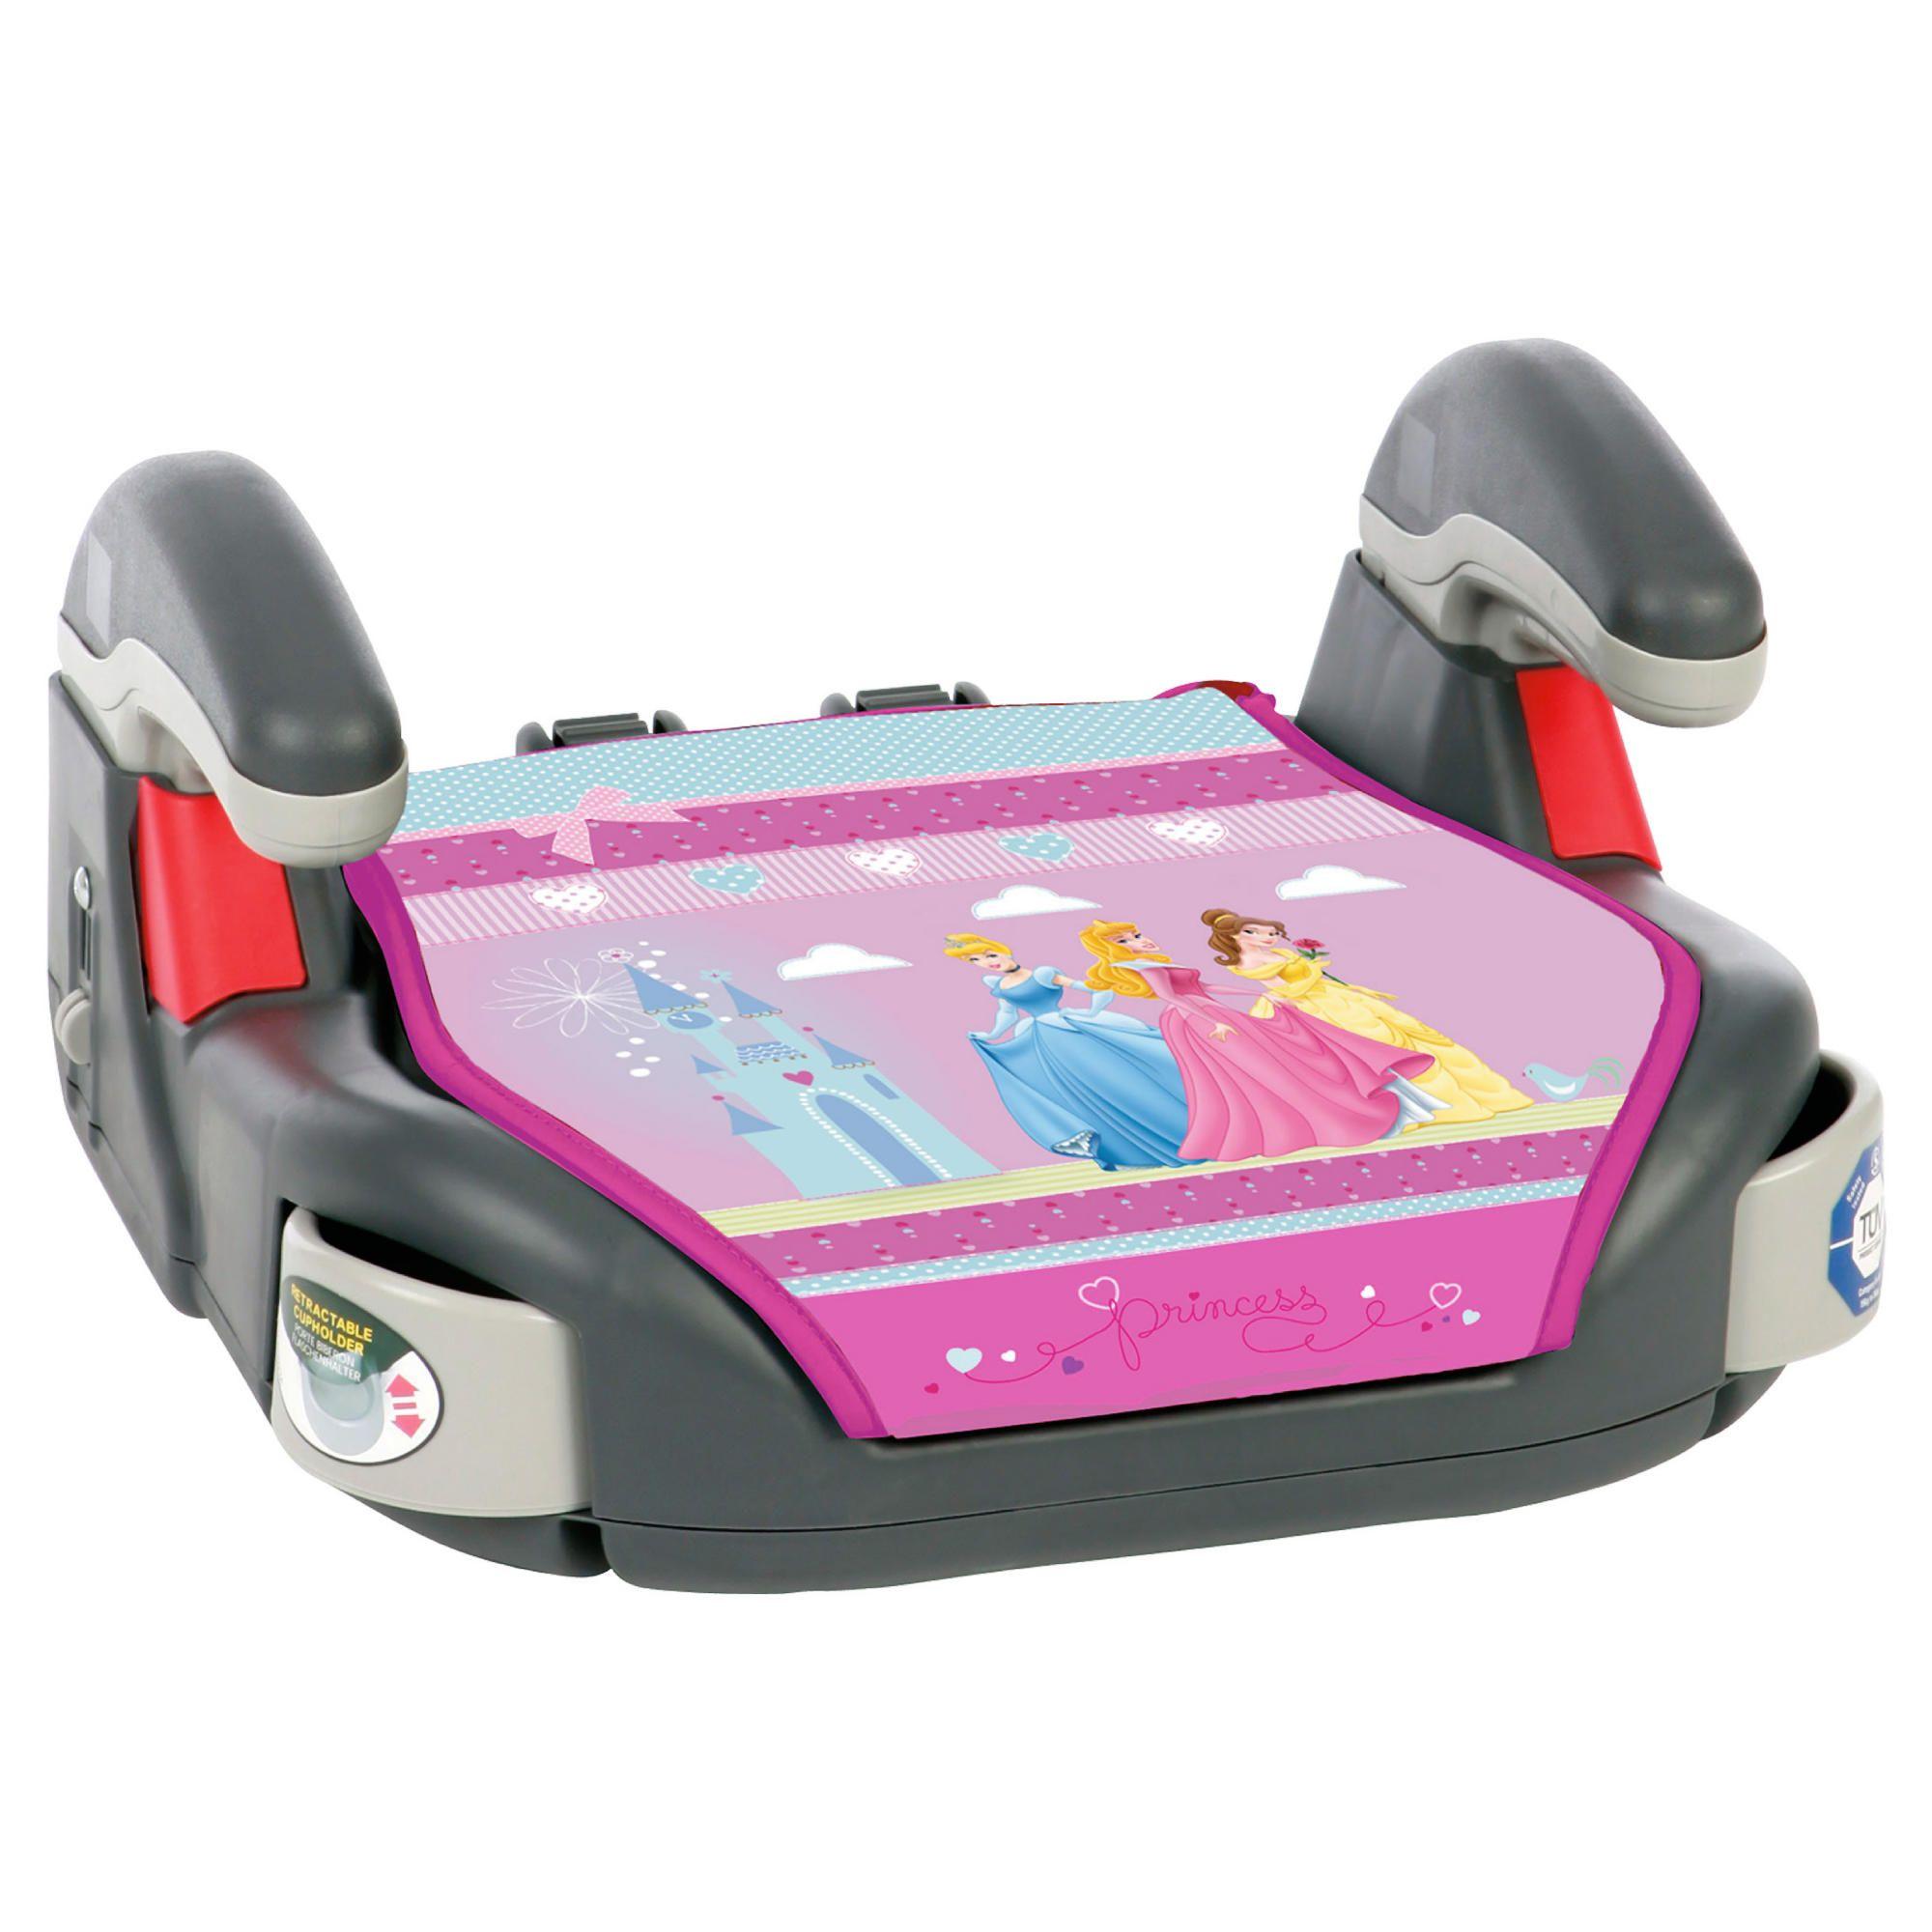 Graco Disney Princess Child Car Seat Compare Prices At